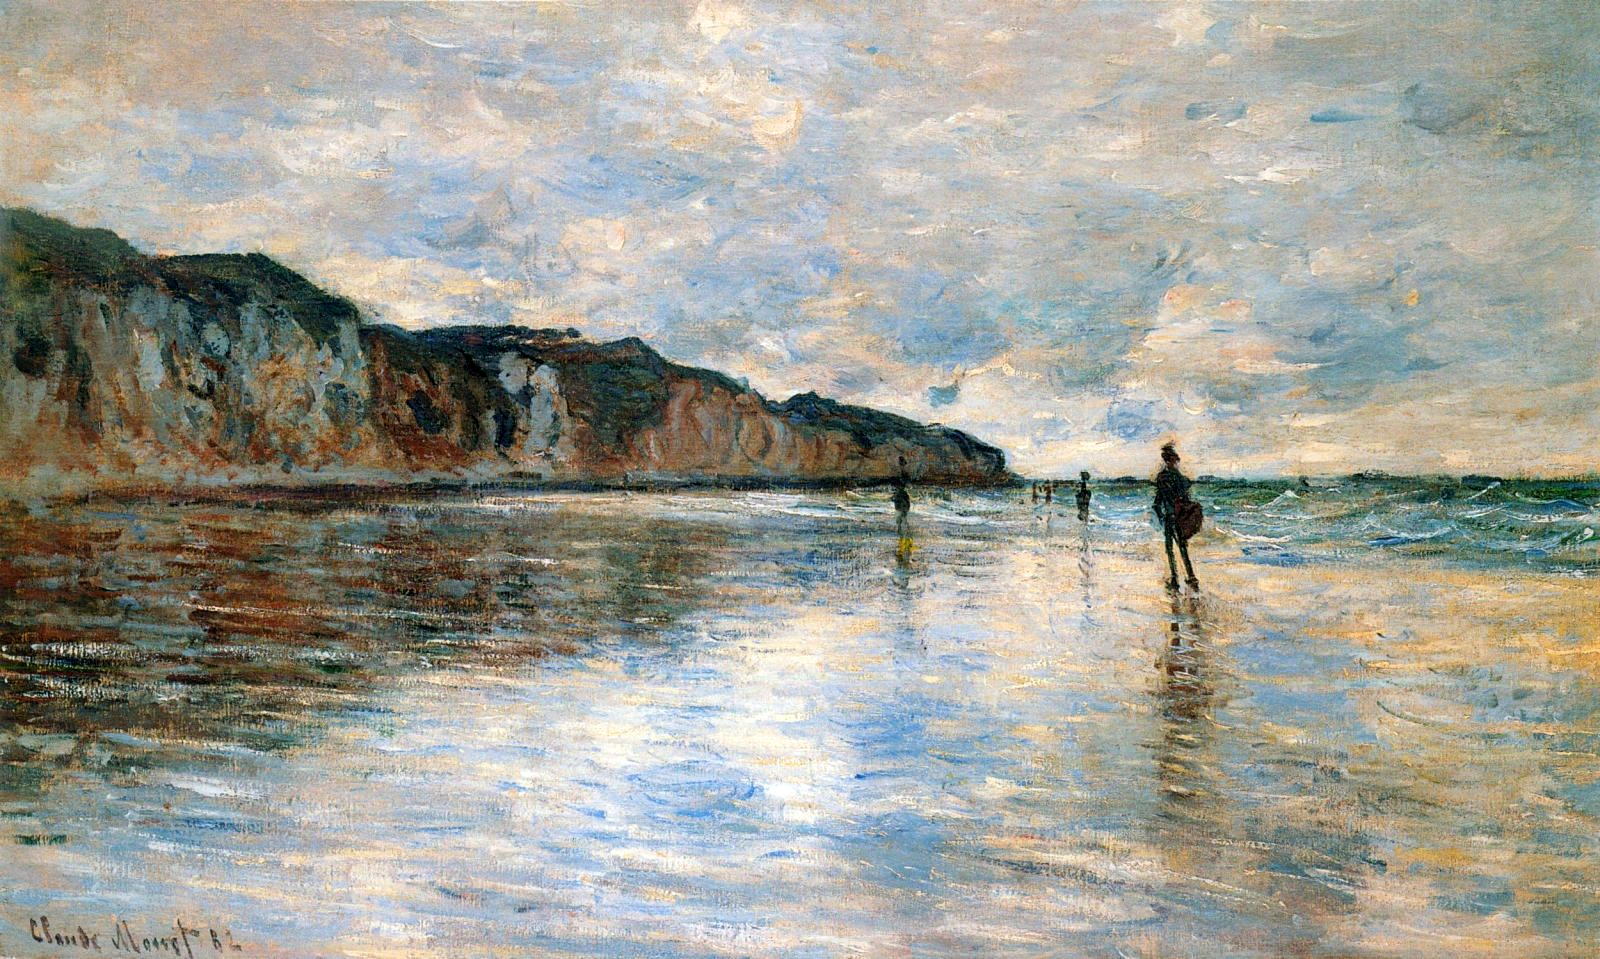 пейзажи - побережье < Пурвилль во время отлива >:: Клод Моне, описание картины - Моне Клод (Claude Monet) фото